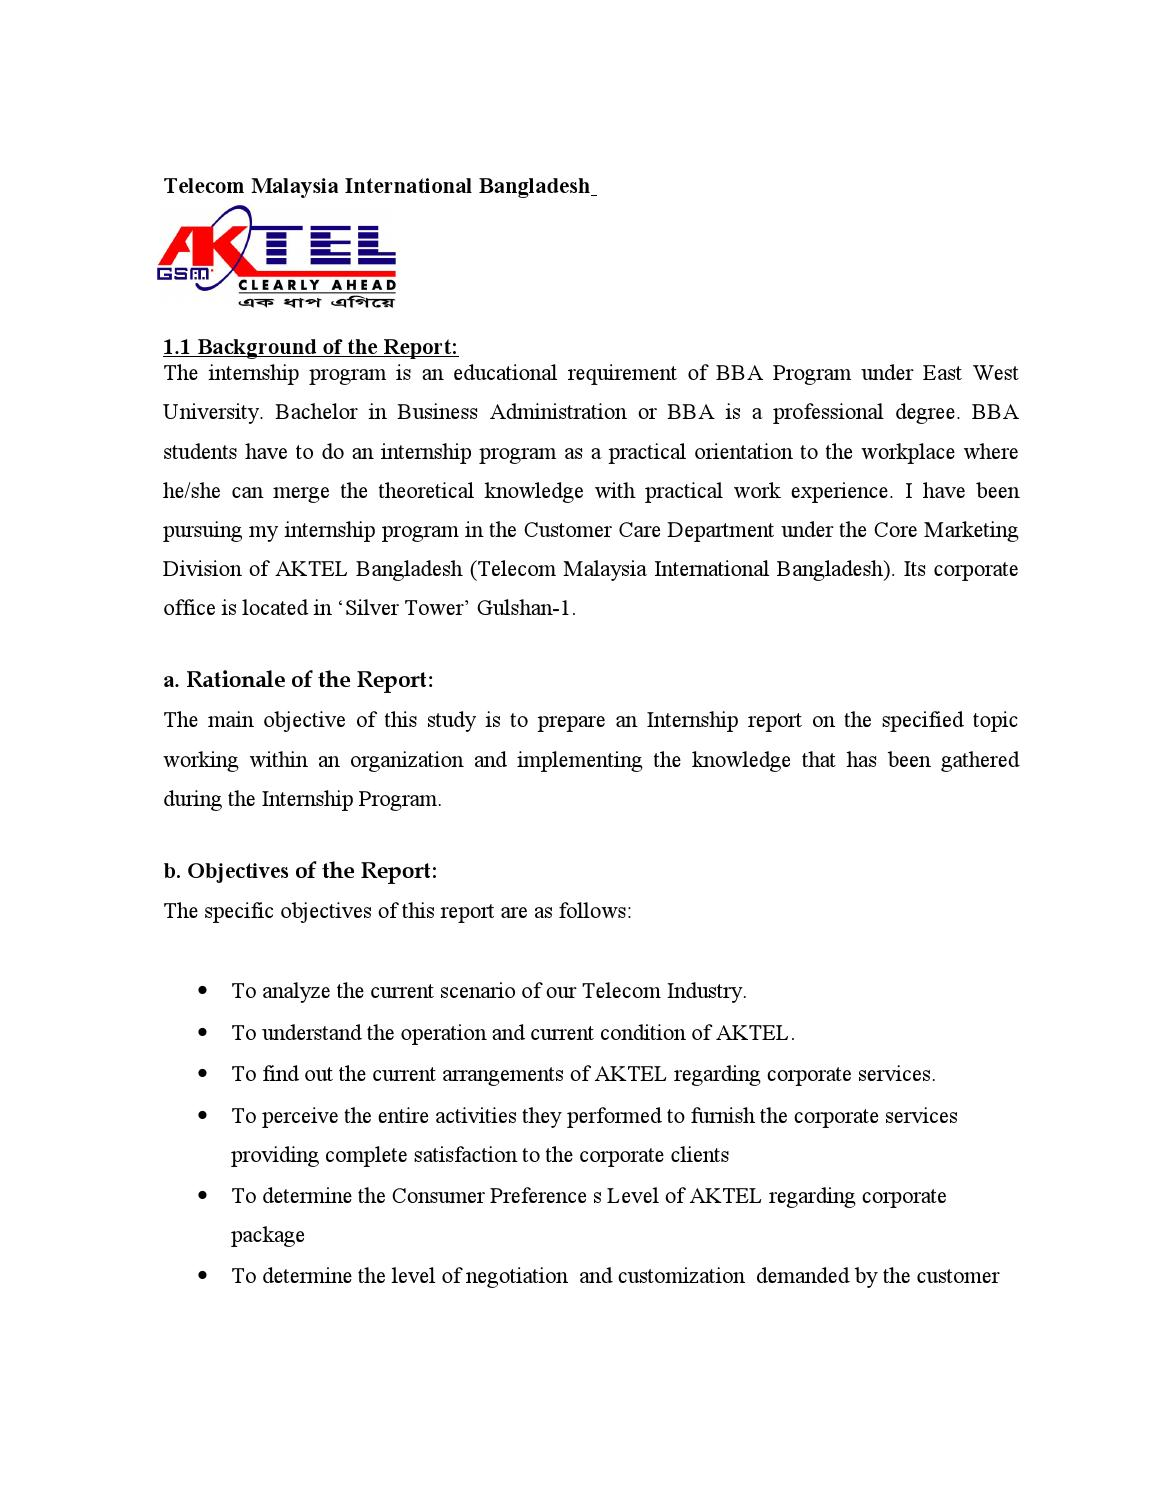 Telecom Malaysia International Bangladesh by lawjuris - issuu